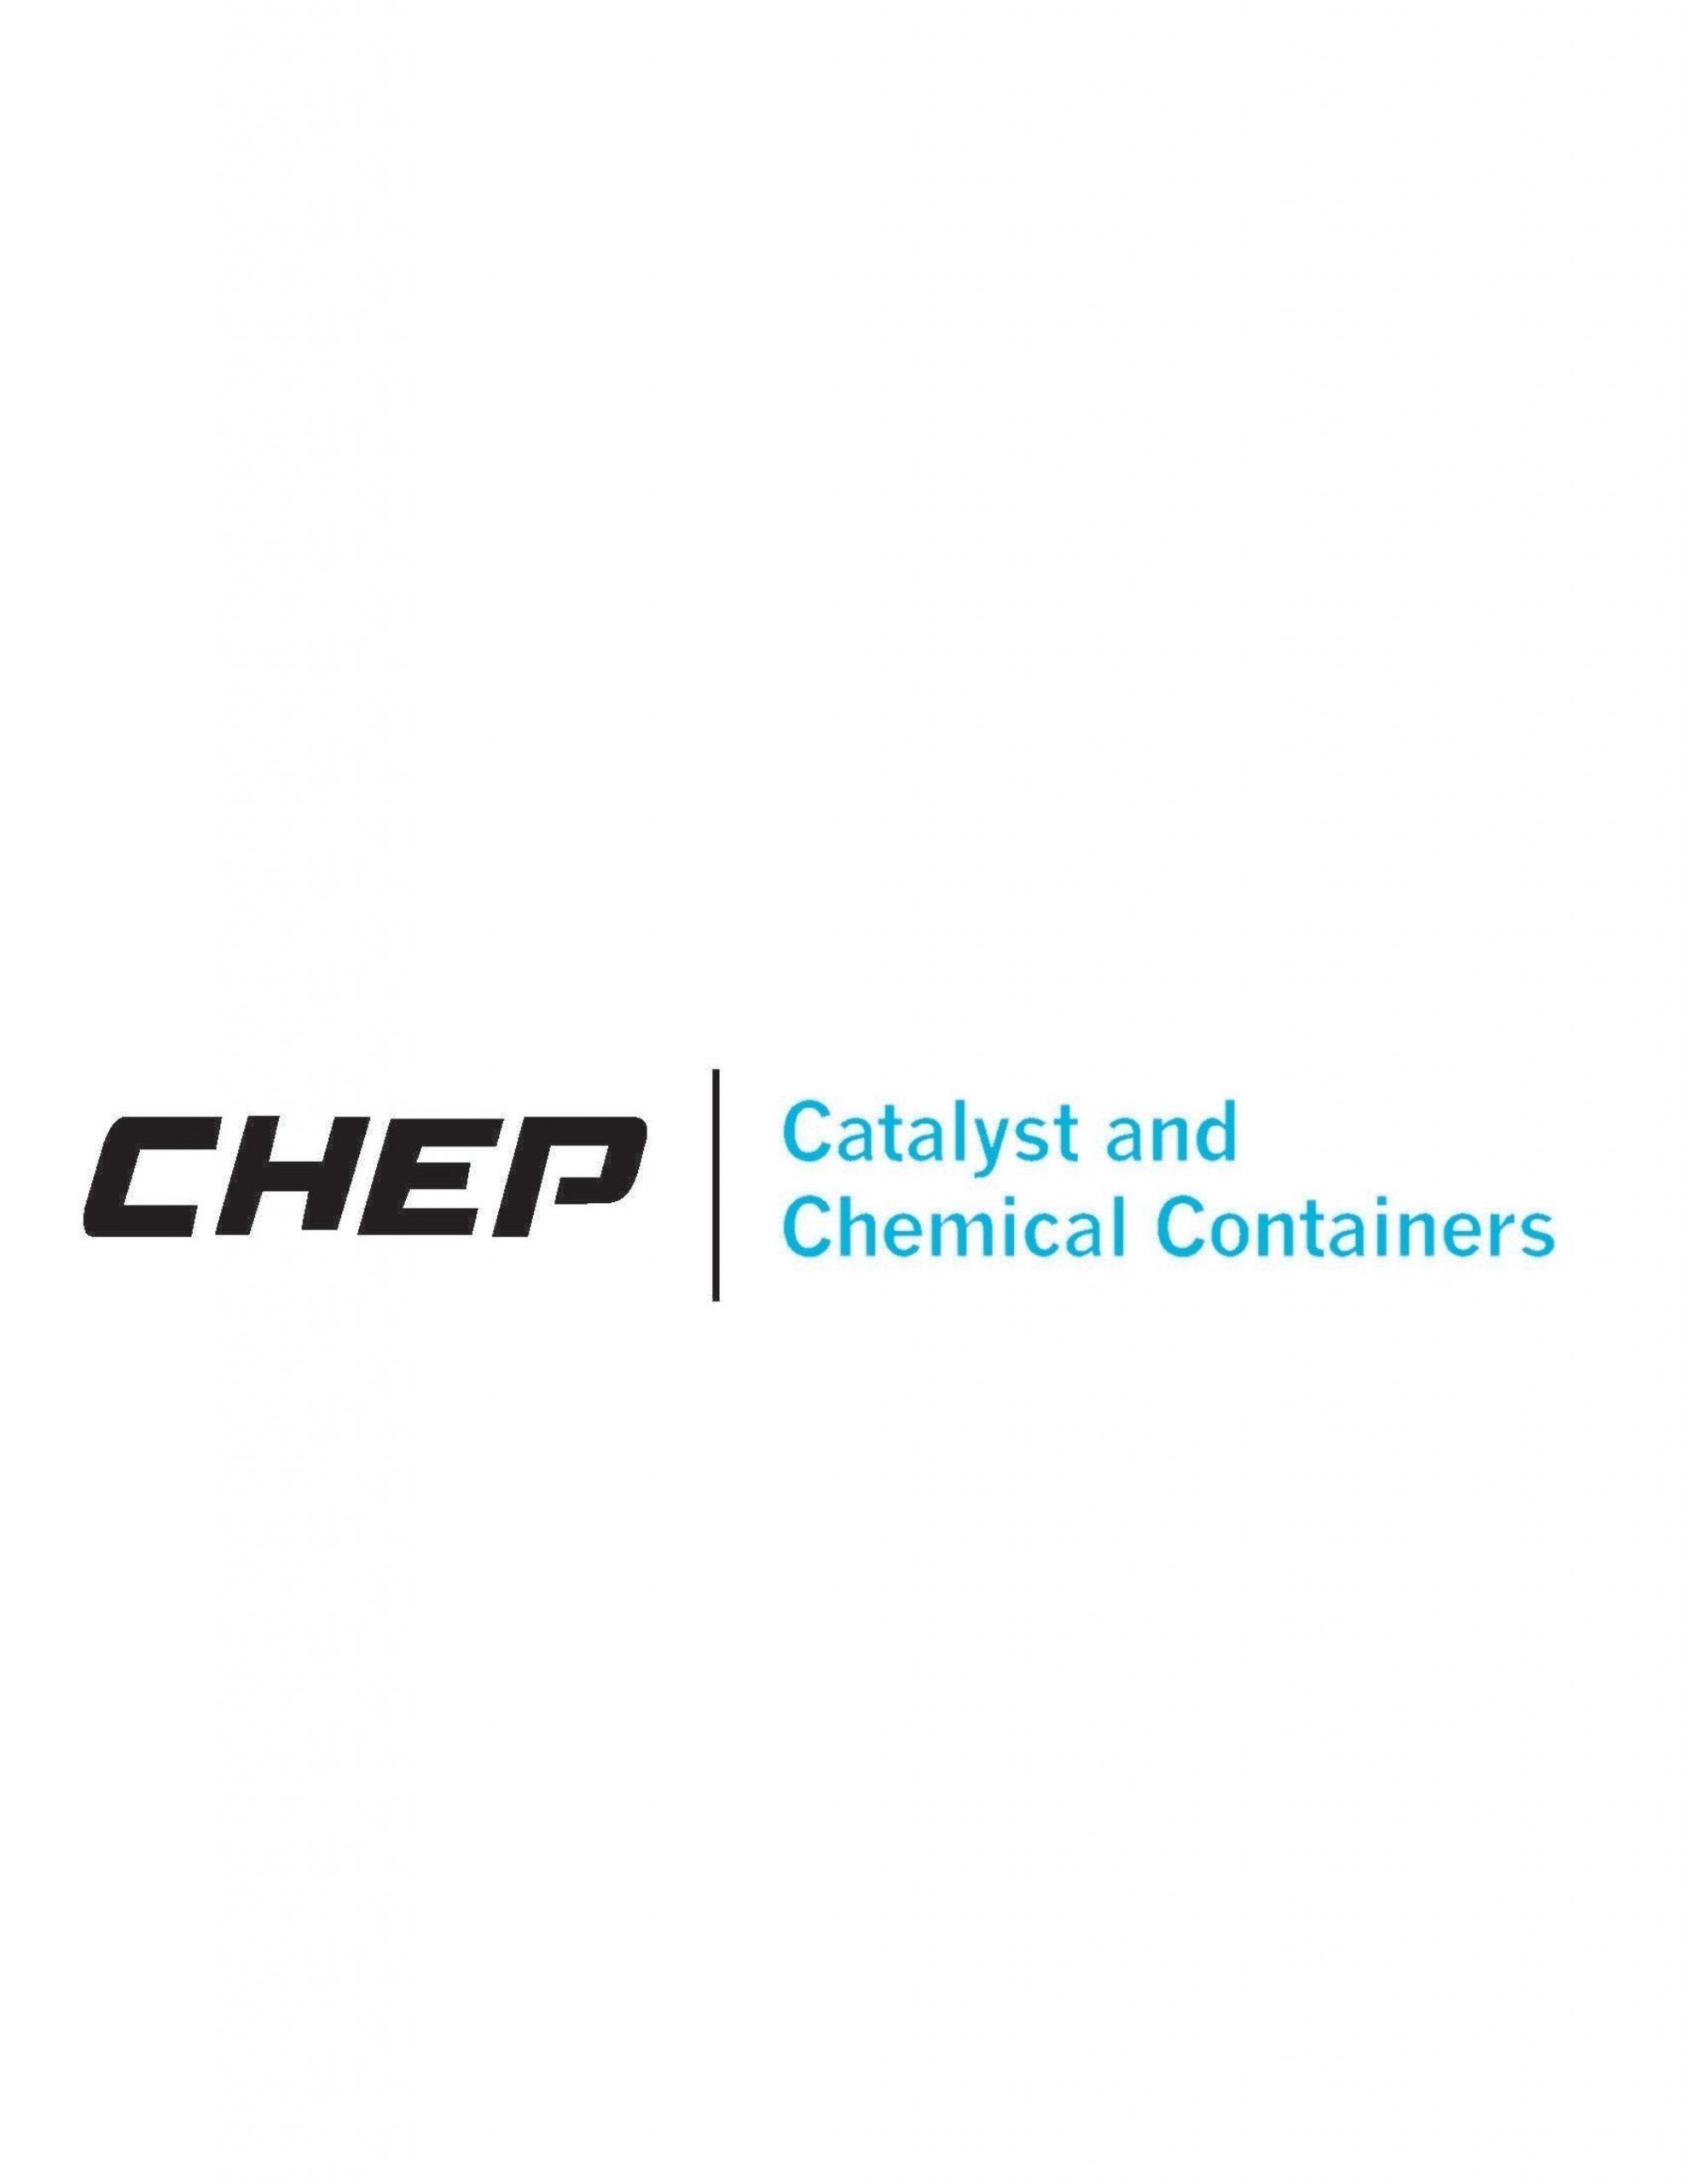 (PRNewsFoto/CHEP Catalyst & Chemical.......)